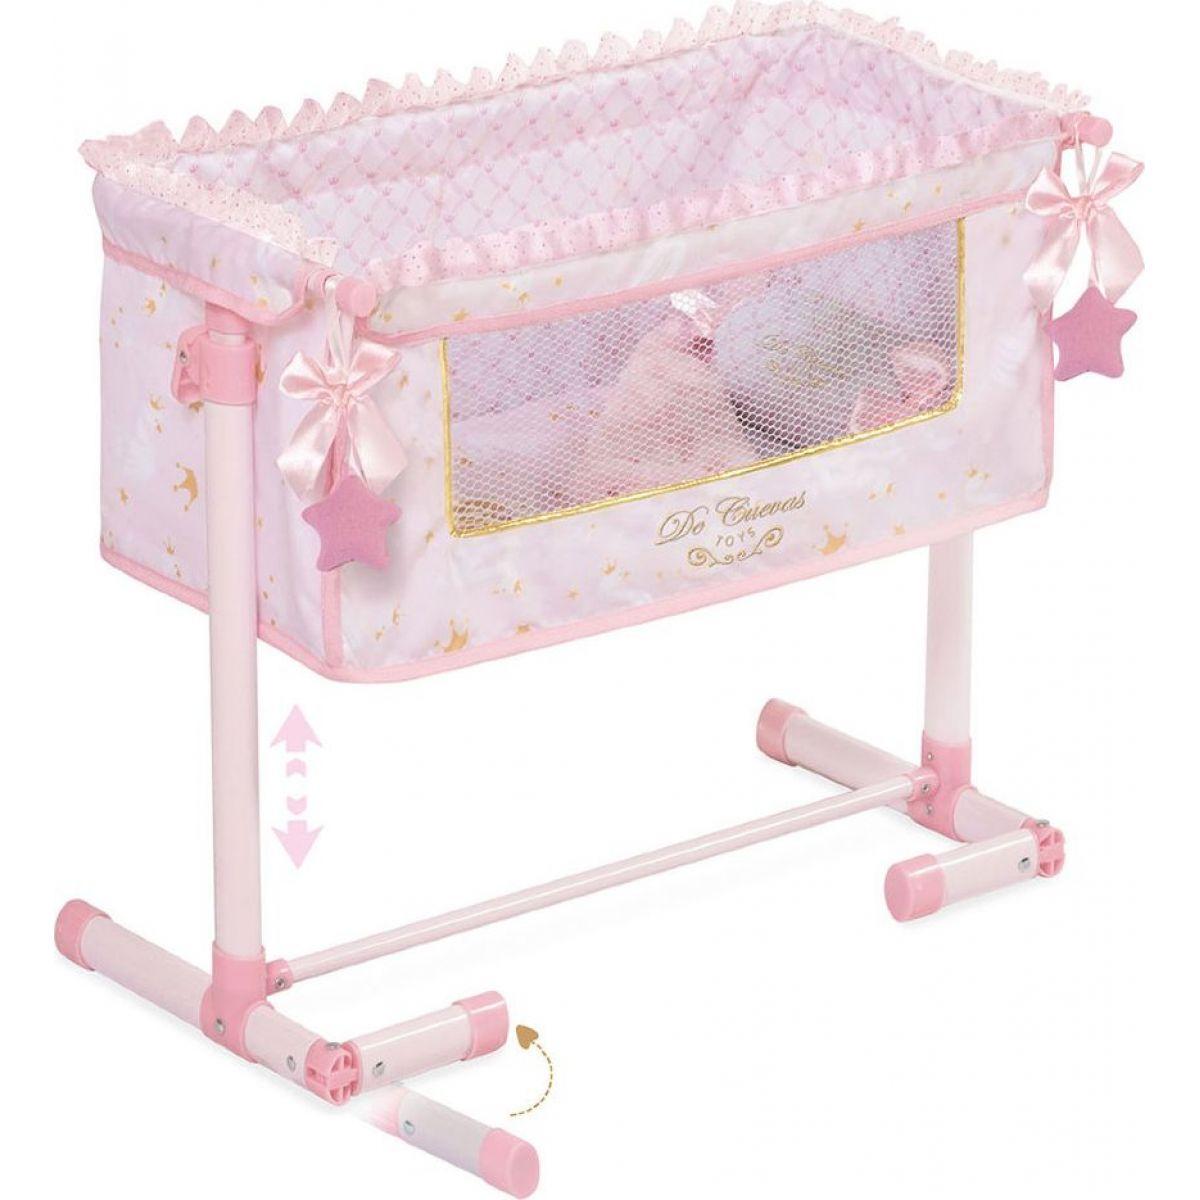 DeCueavas Novorozenecká postýlka pro panenky s doplňky Maria